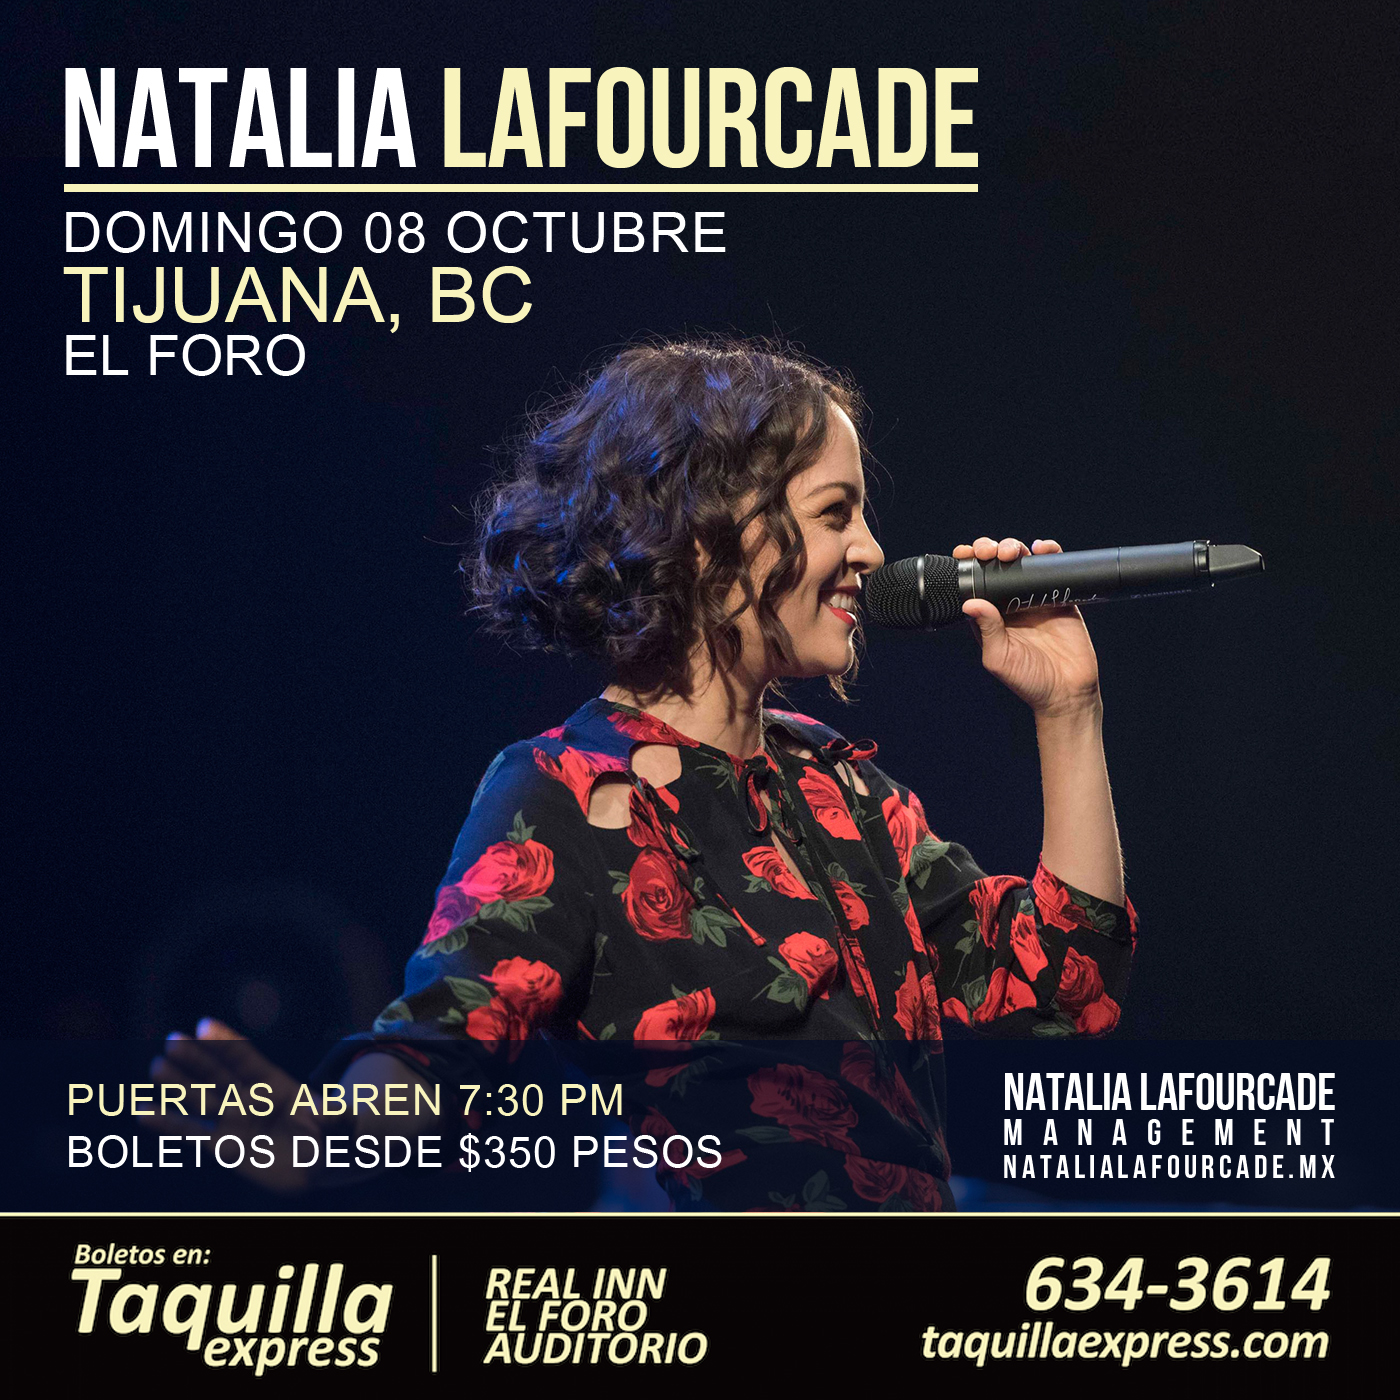 Natalia Lafourcade en El Foro de Tijuana, BC